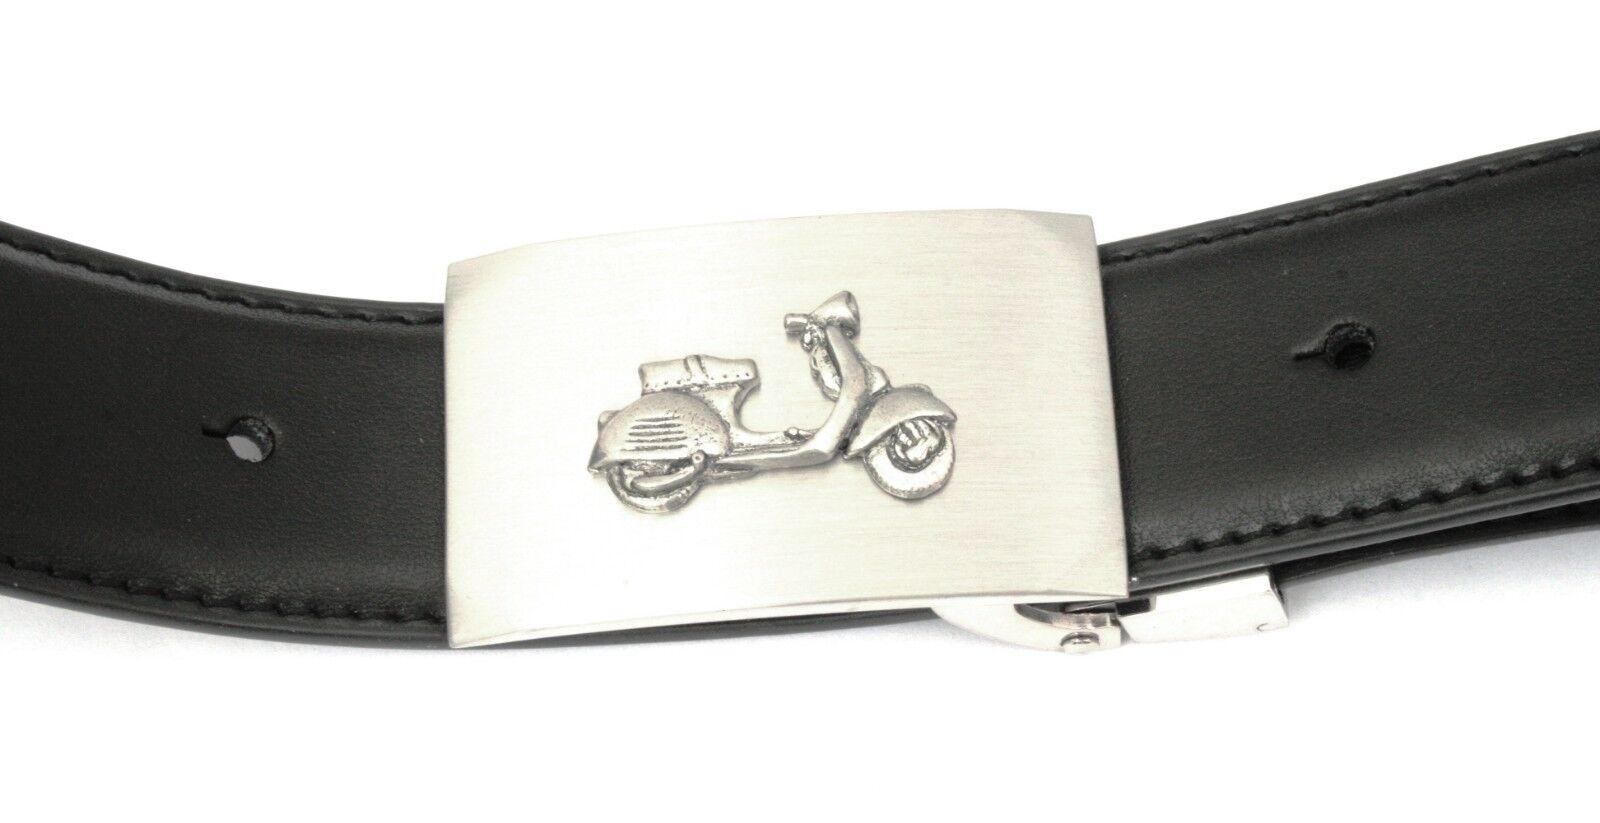 Vespa Scooter Buckle and Belt Set Black Leather Ideal Motorbike Gift 384